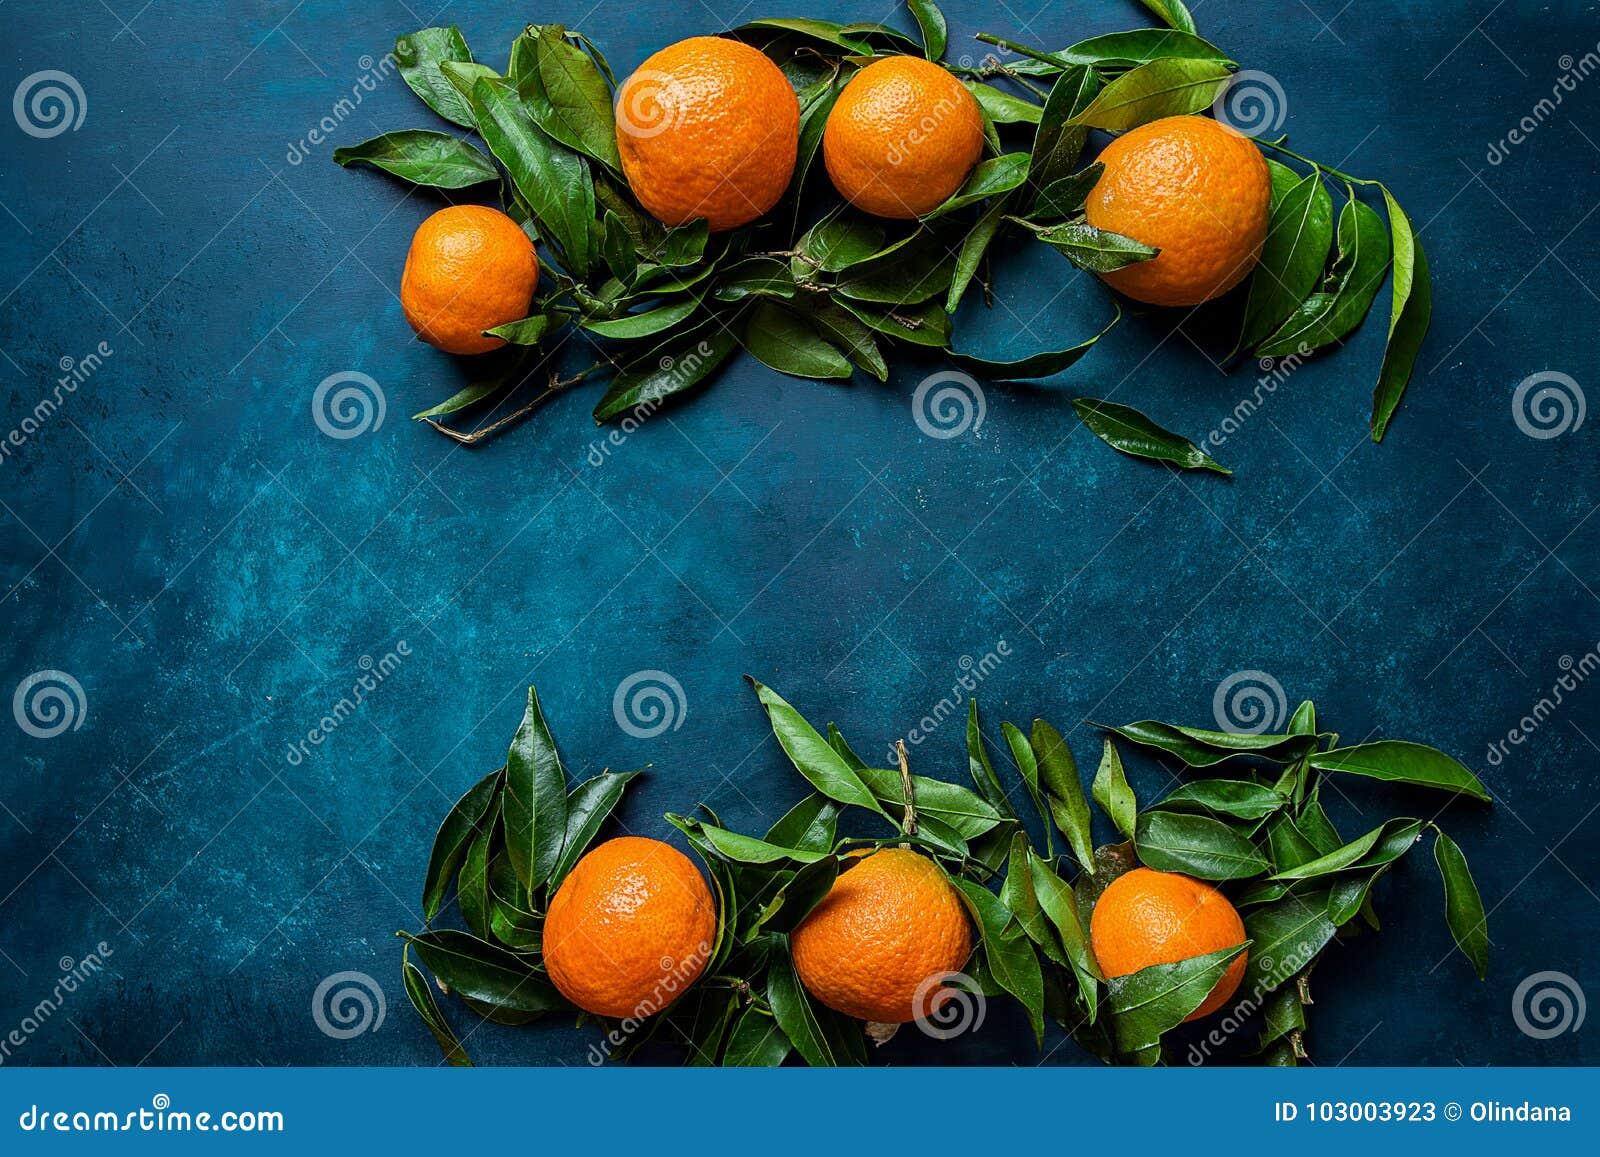 vibrant orange tangerines on branches green leaves arranged in composition border frame on dark blue background